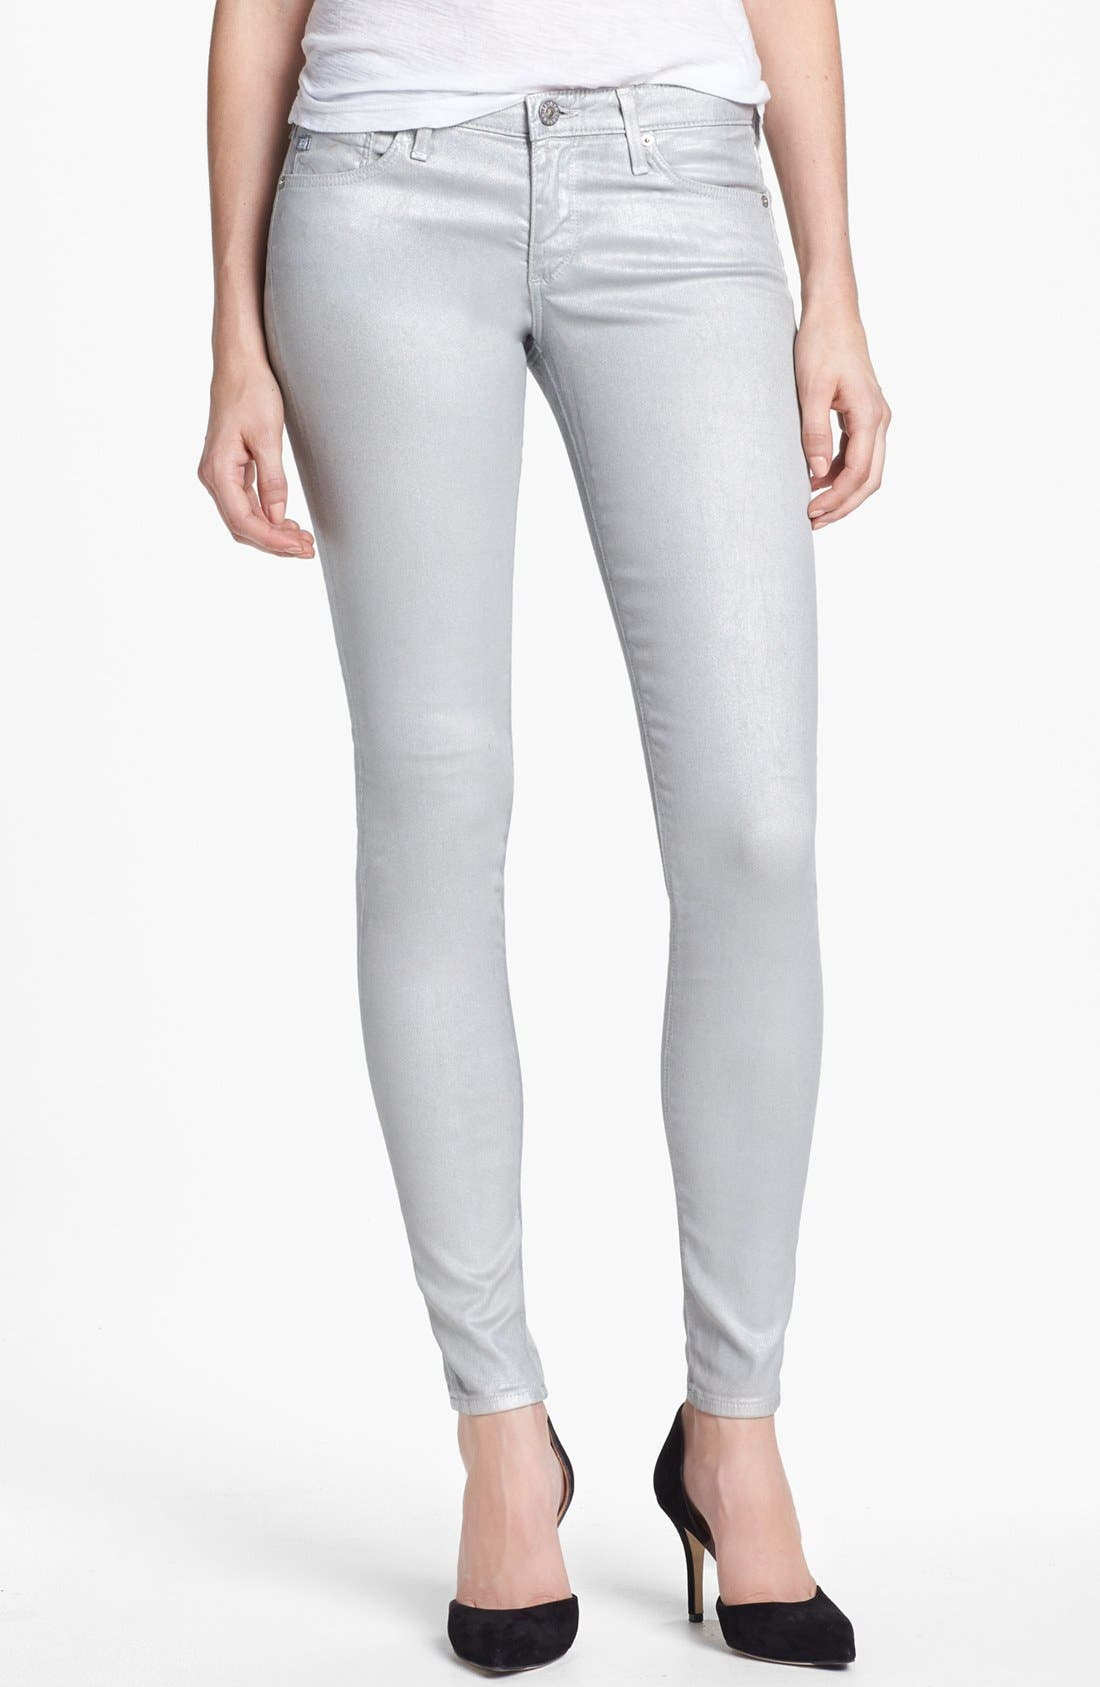 Alternate Image 1 Selected - AG Jeans 'The Absolute Legging' Metallic Skinny Jeans (Eyeshadow Silver)